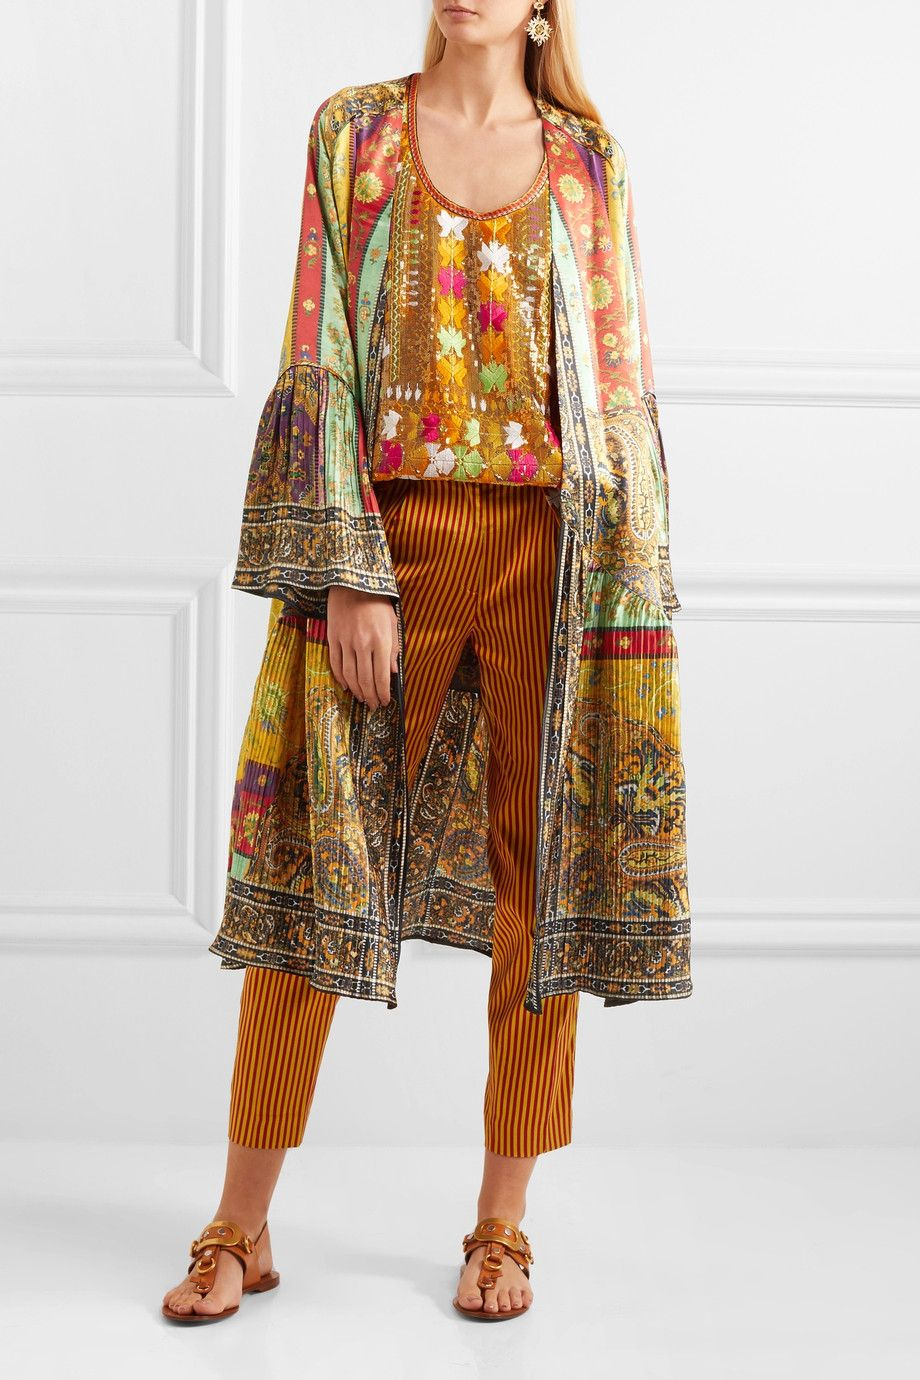 Etro printed plissé washedsilk jacket netaportercom Одежда